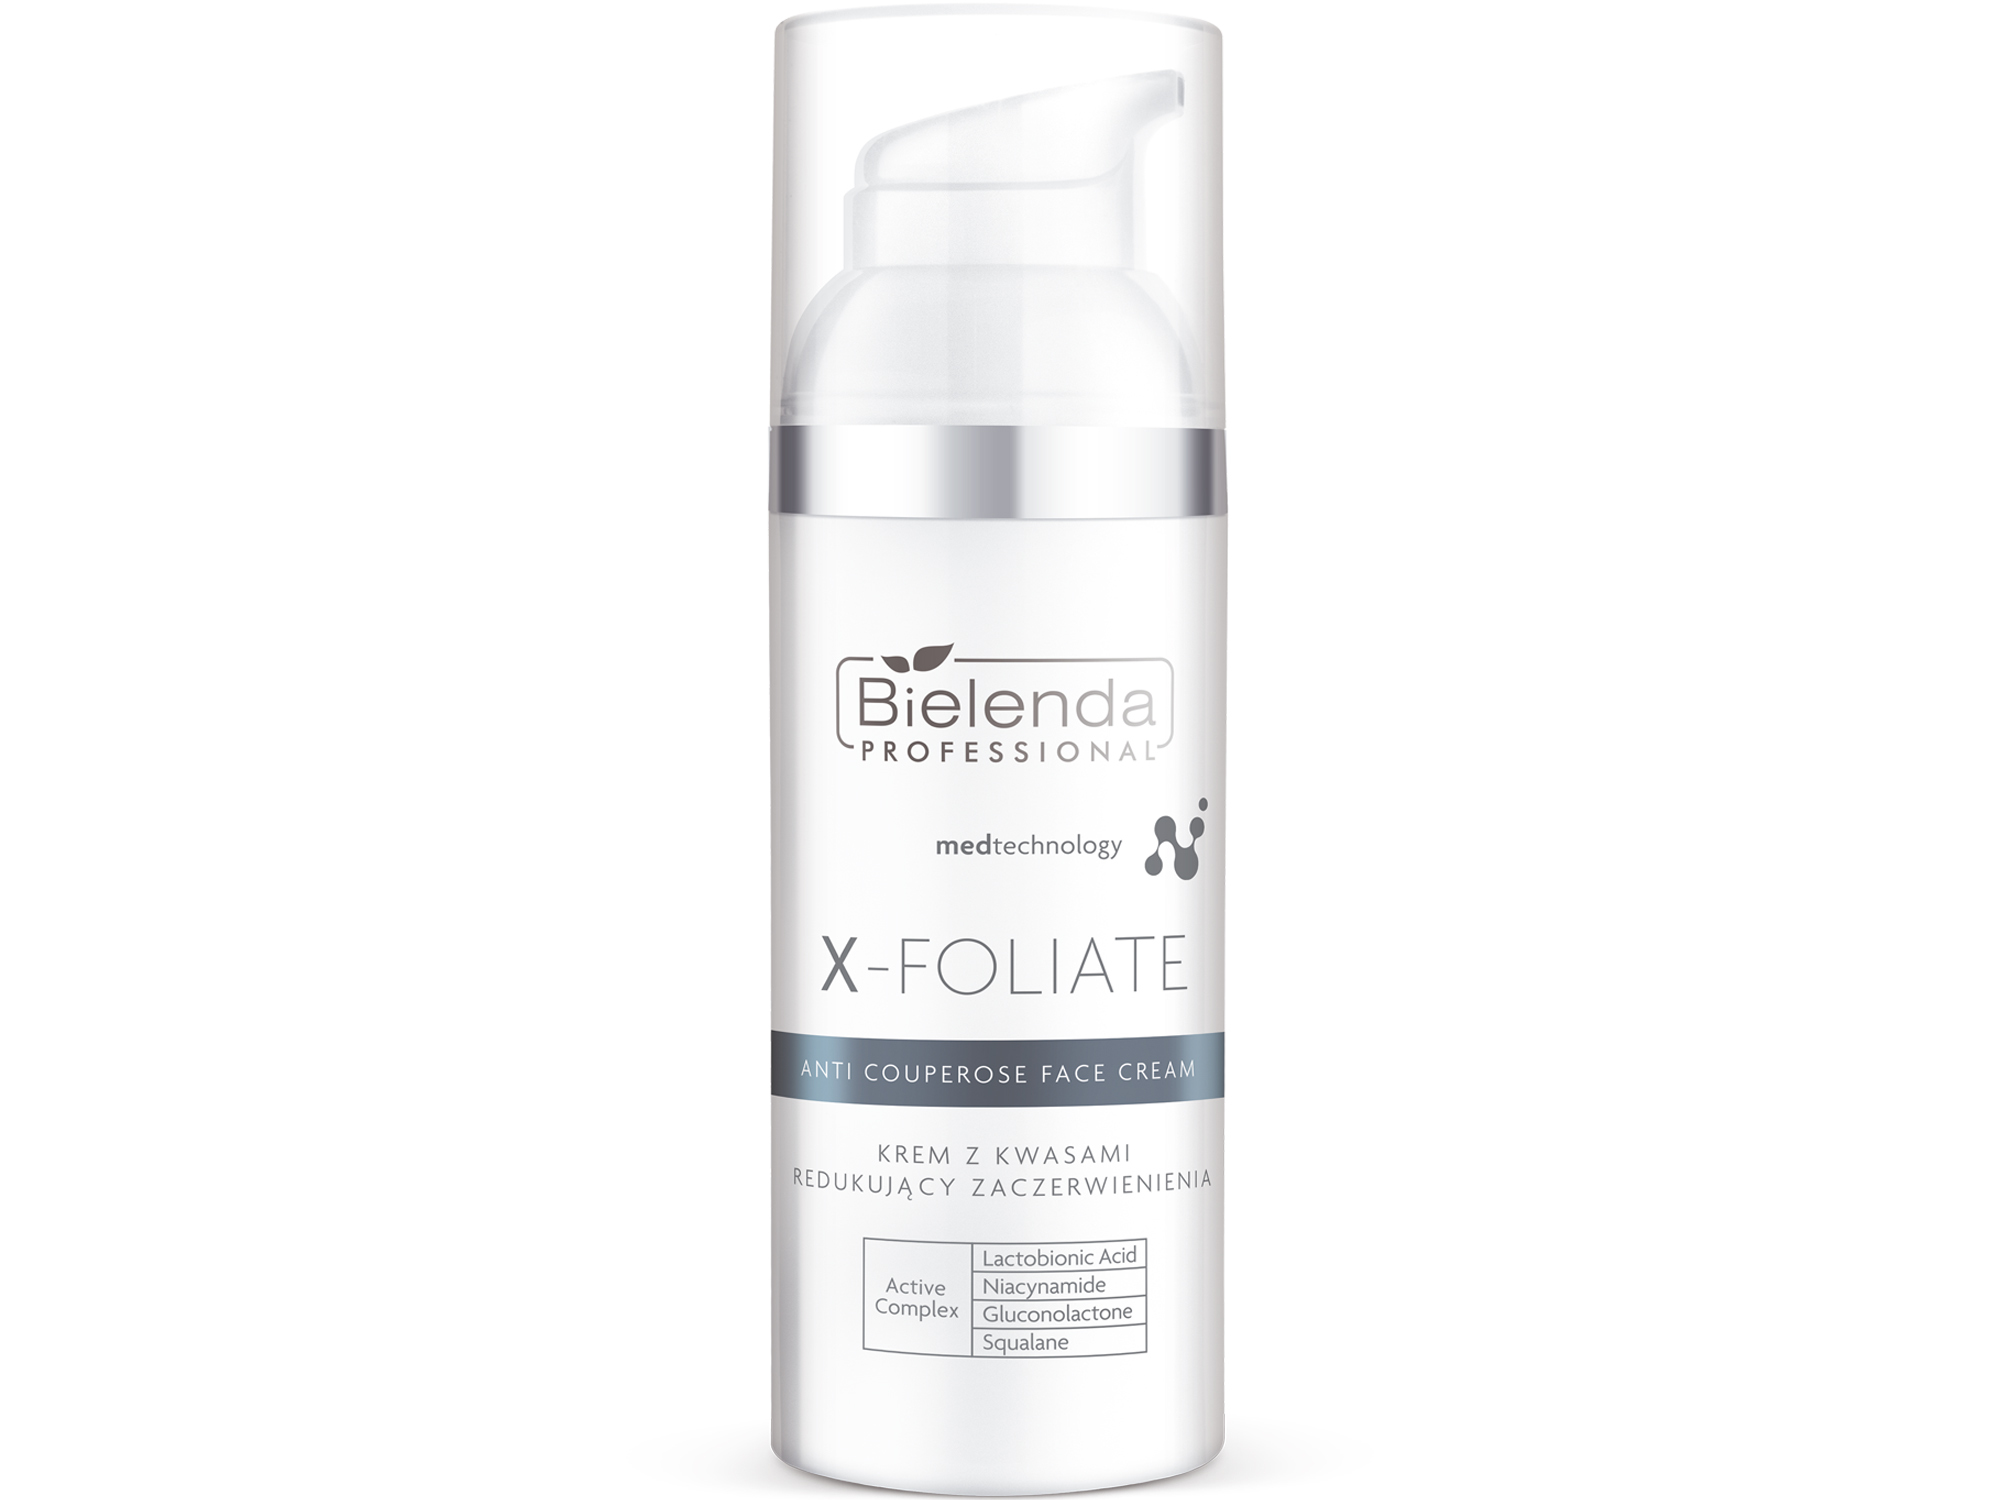 X-FOLIATE Anti Couperose Крем для лица  с кислотами склонной к куперозу